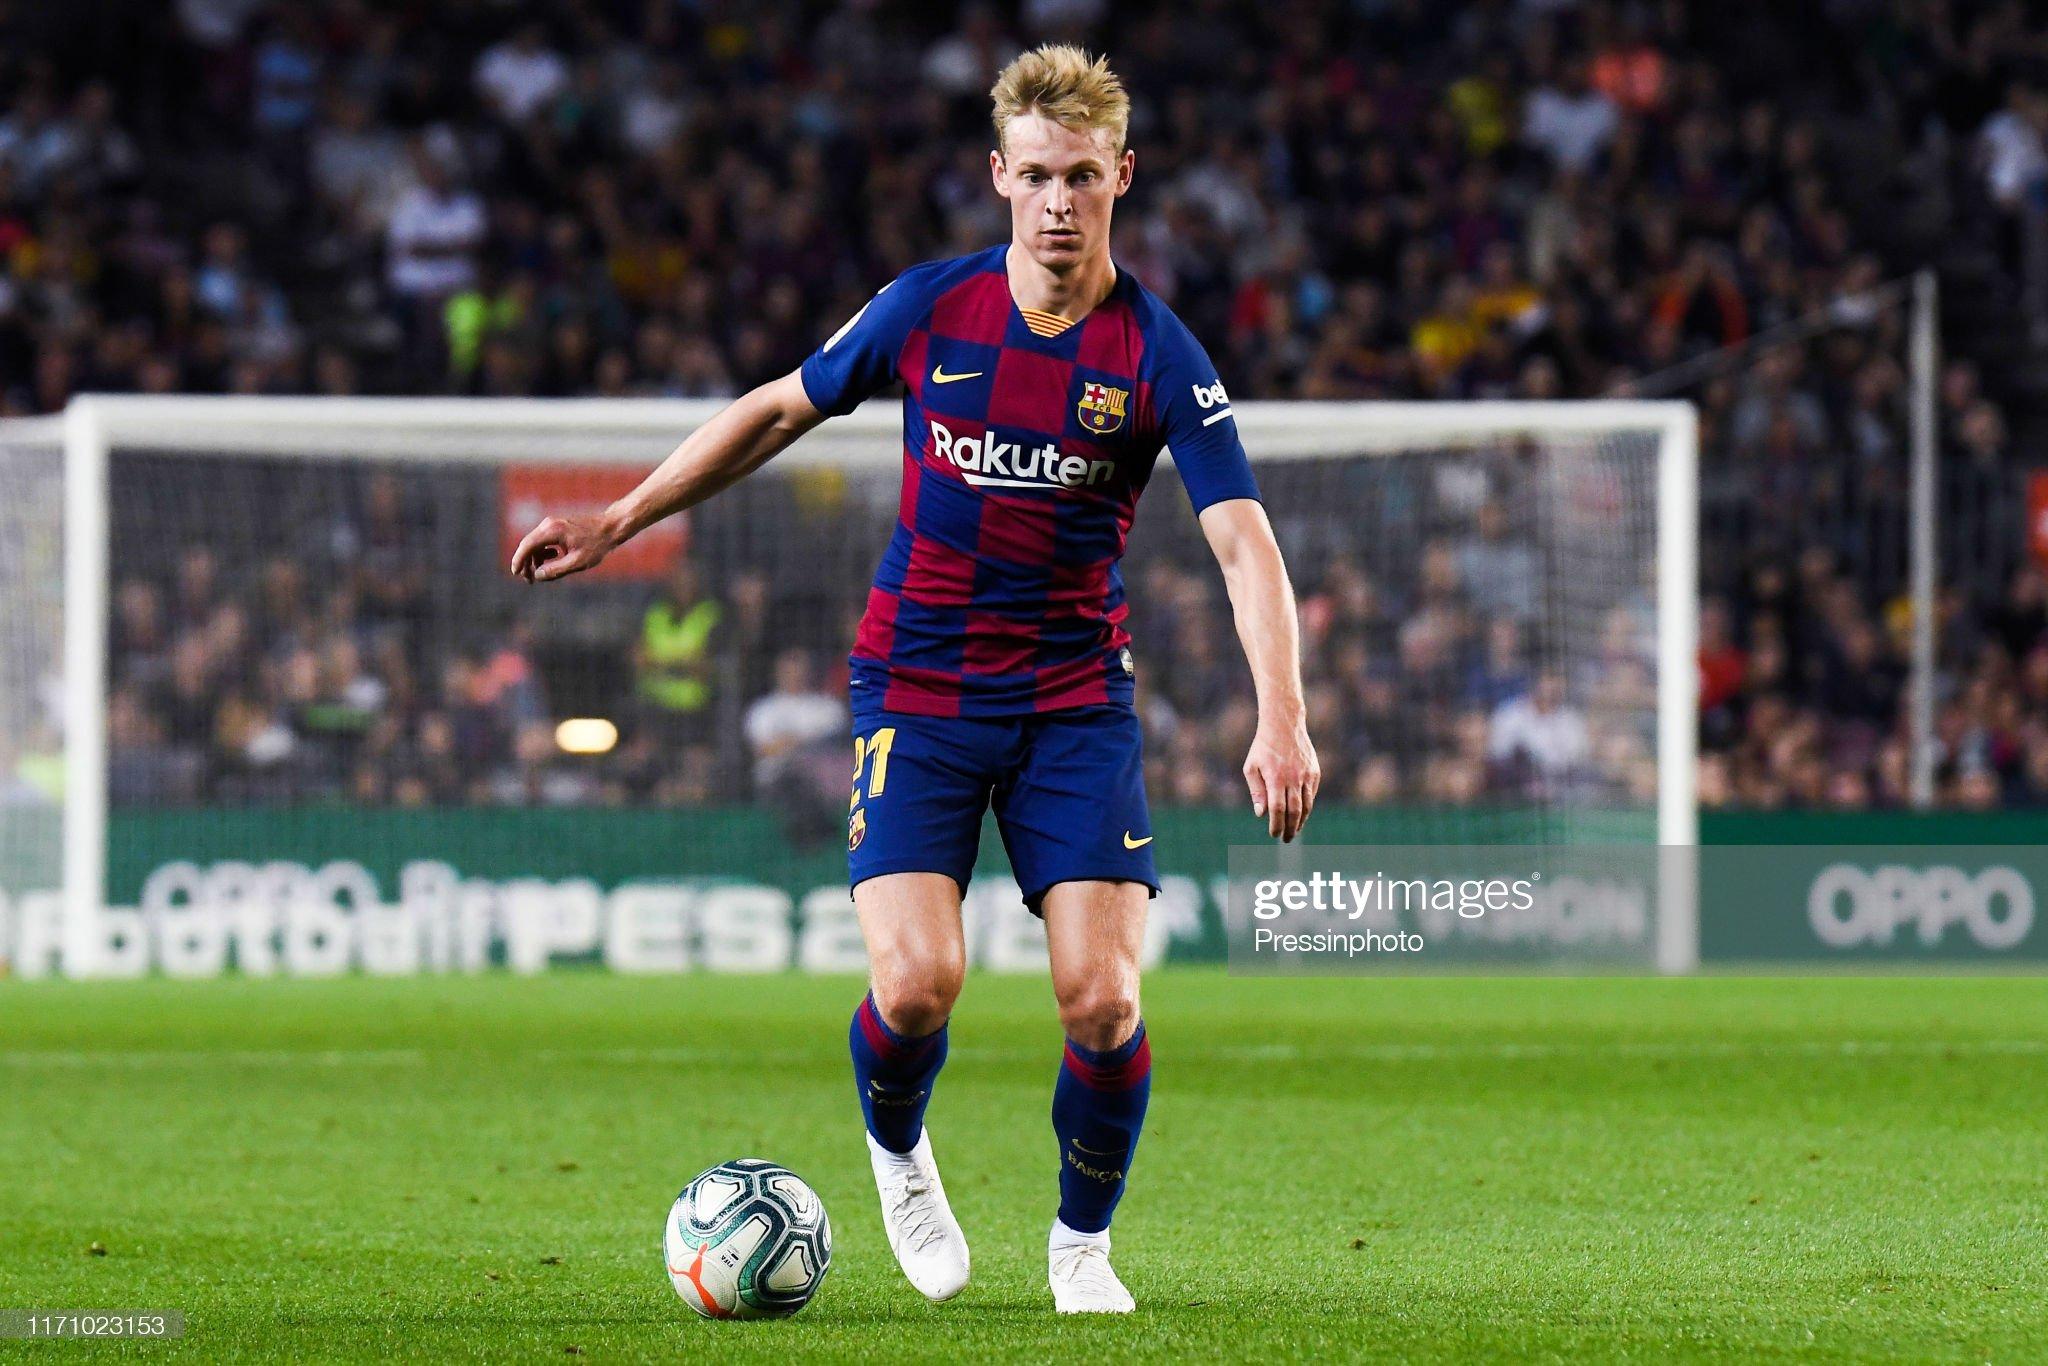 صور مباراة : برشلونة - فياريال 2-1 ( 24-09-2019 )  Frenkie-de-jong-of-fc-barcelona-during-the-liga-match-between-and-picture-id1171023153?s=2048x2048